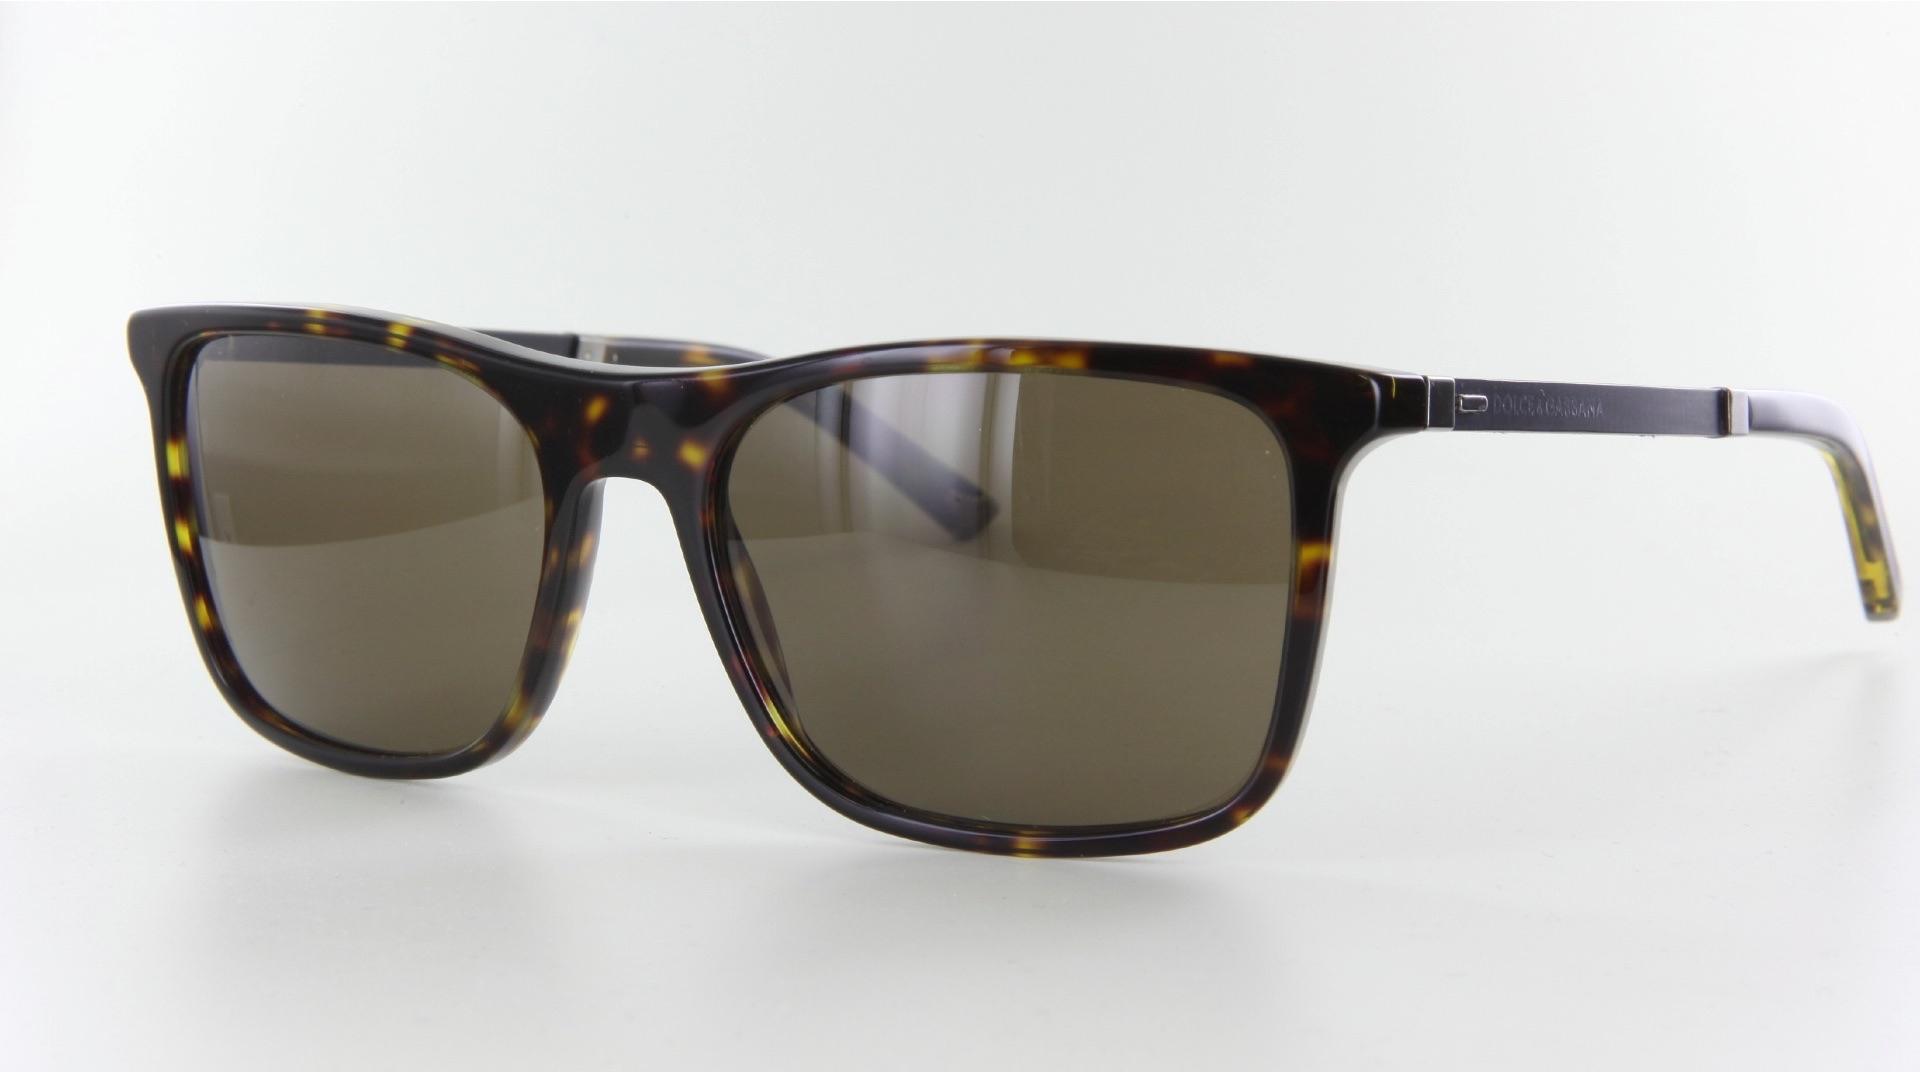 Dolce & Gabbana - ref: 72092